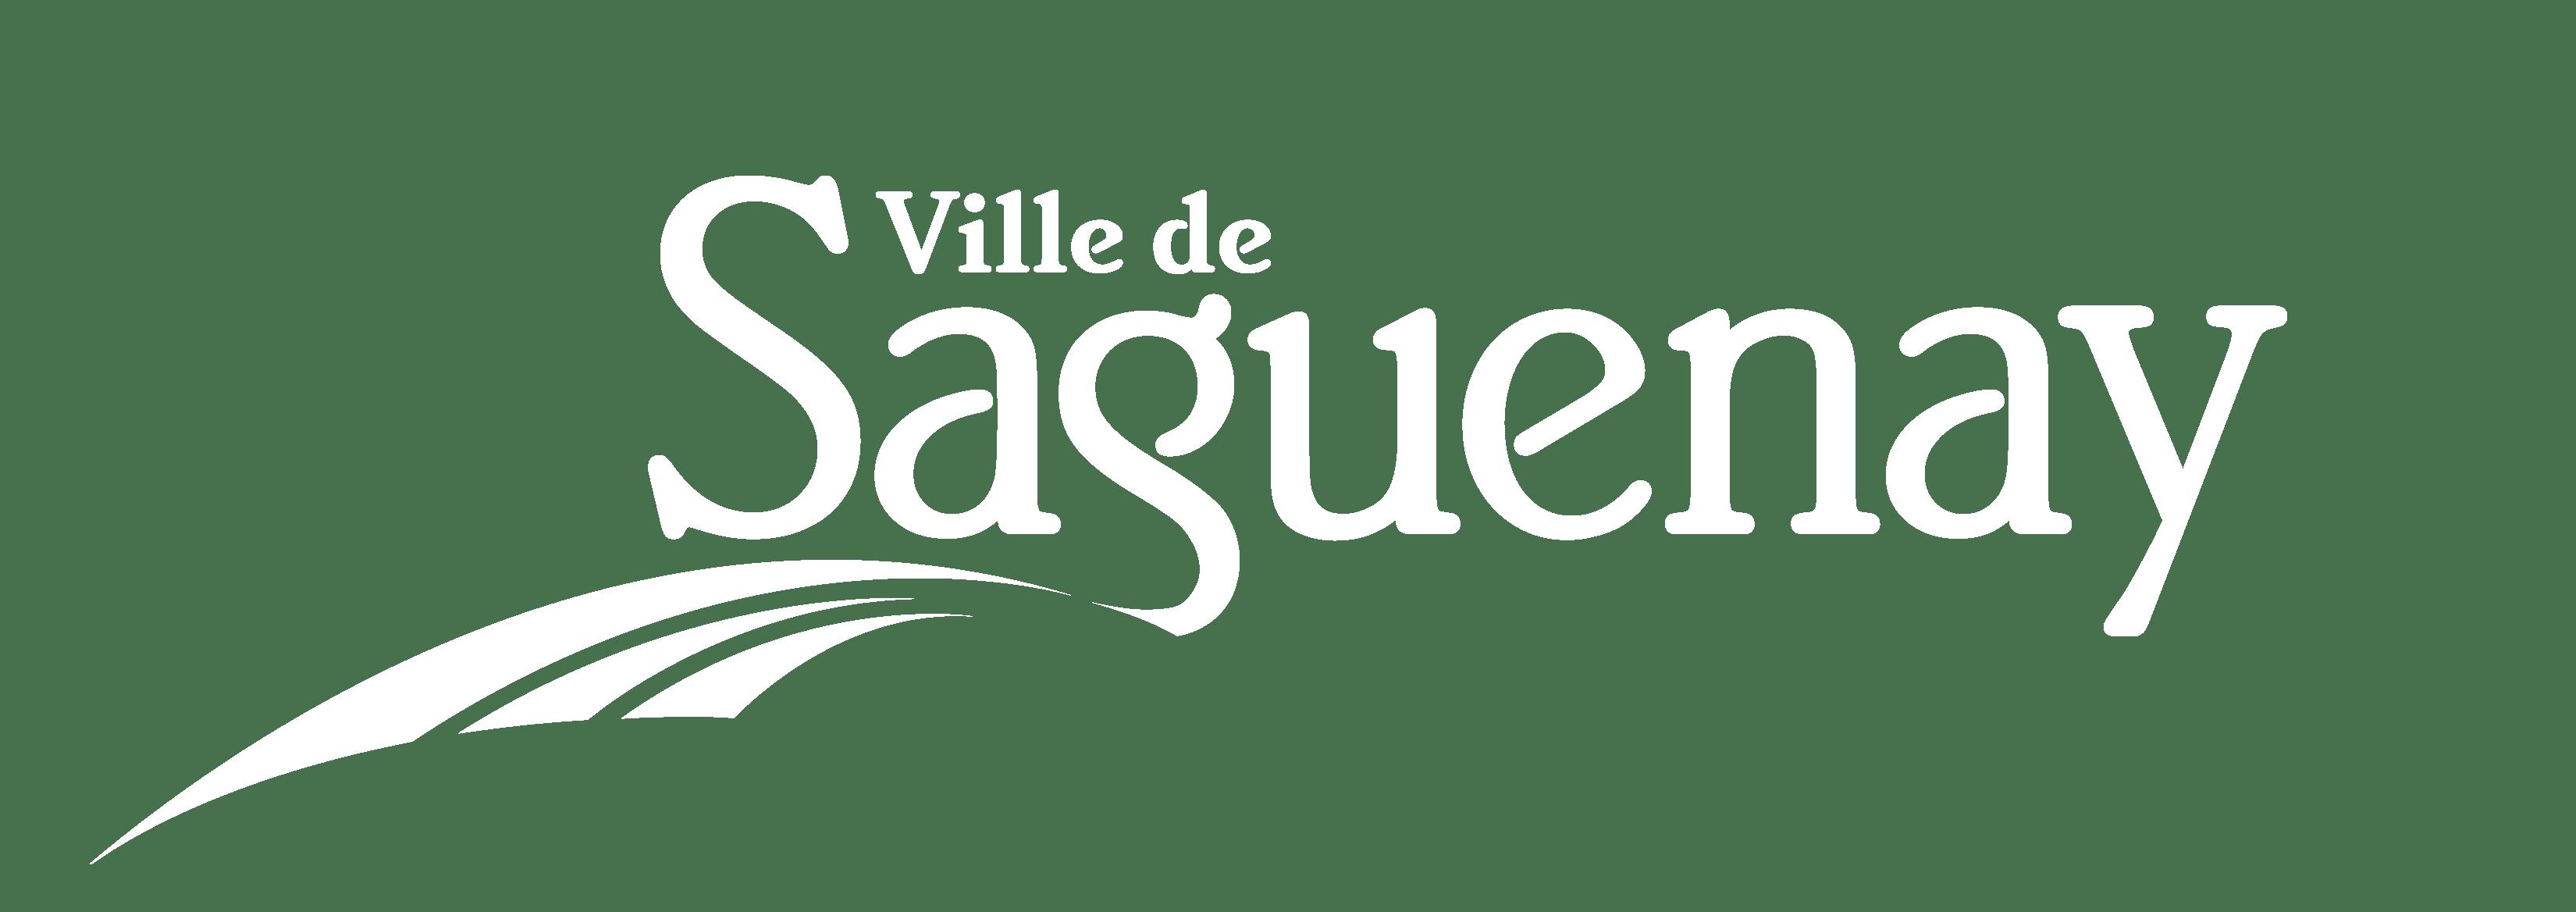 Bâtissons Saguenay